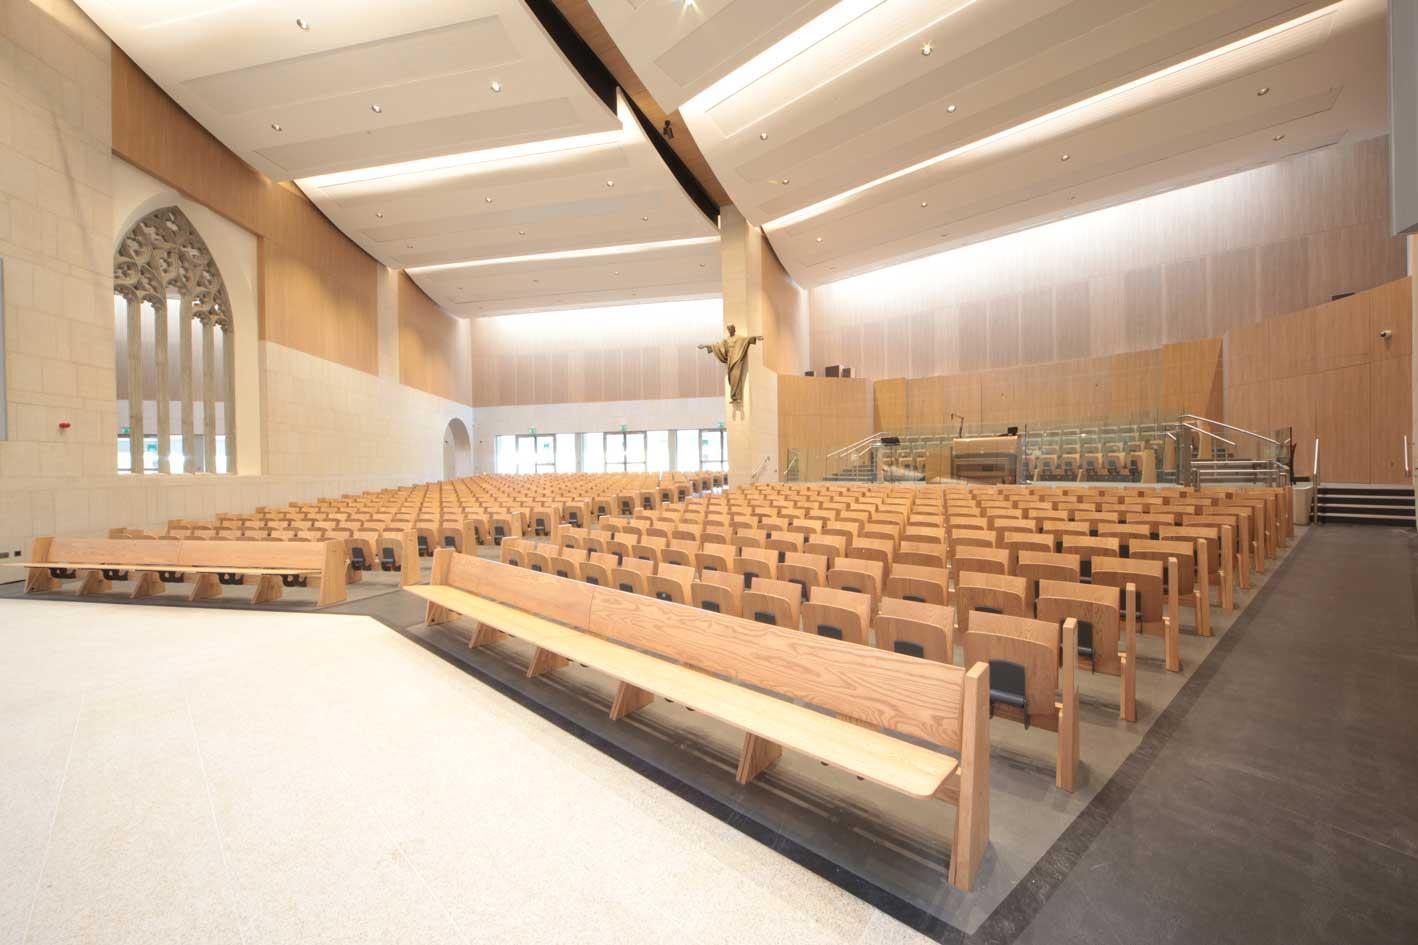 Knock Basilica Flip up seating front view bespoke wooden furniture